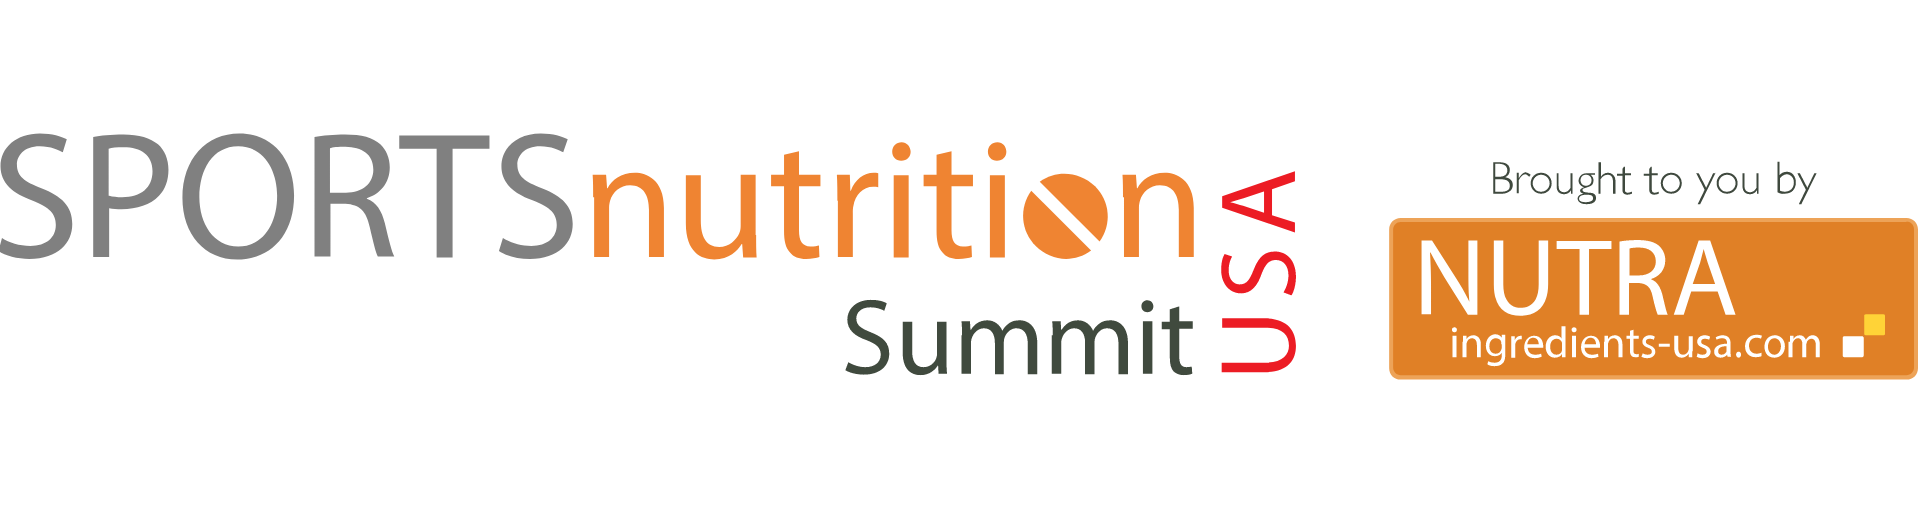 Sport Nutrition Summit logo